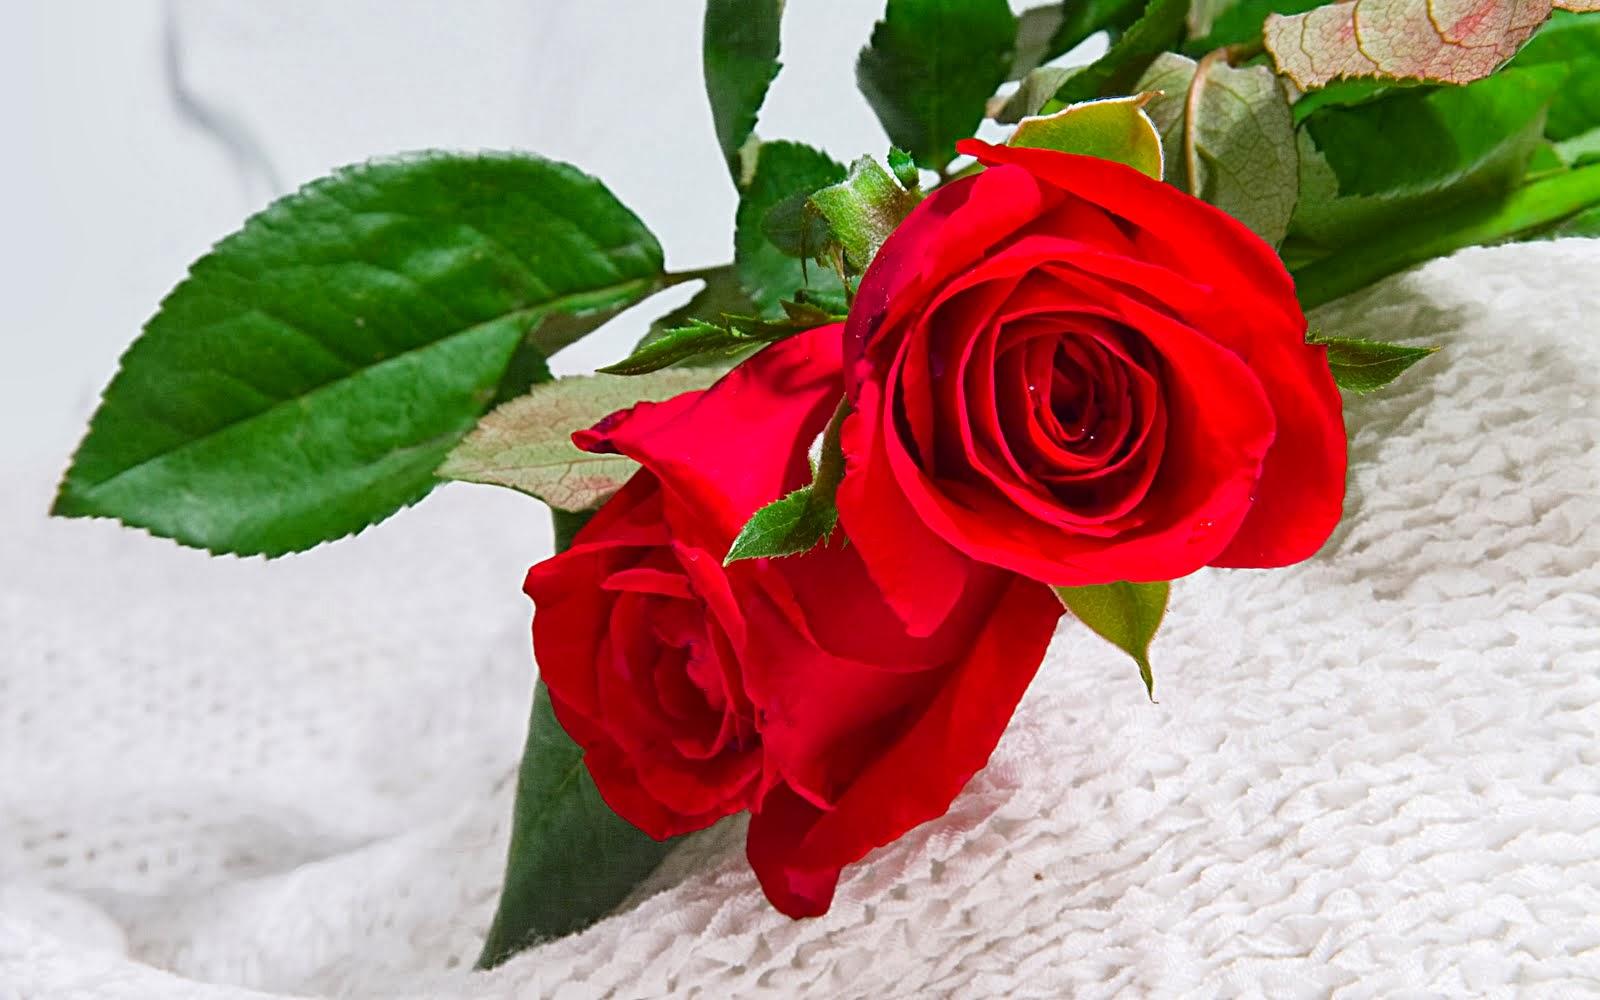 Tazmania Wallpaper Iphone 9 Wallpaper Bunga Mawar Merah Deloiz Wallpaper